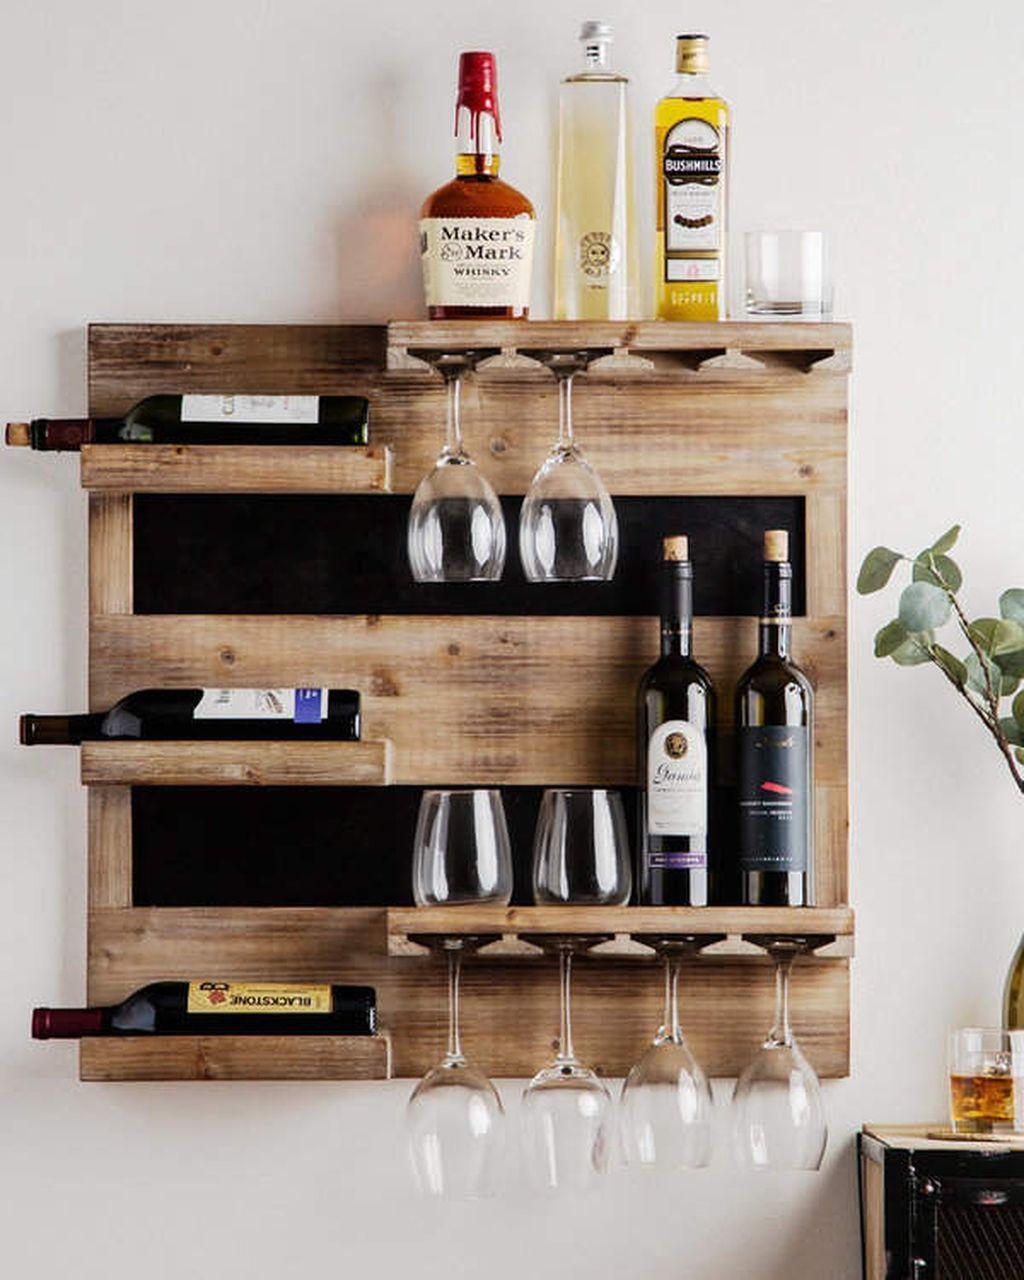 20 Stylish Rustic Wooden Hanging Wine Rack Design Ideas Diy Home Bar Wine Rack Design Hanging Wine Rack